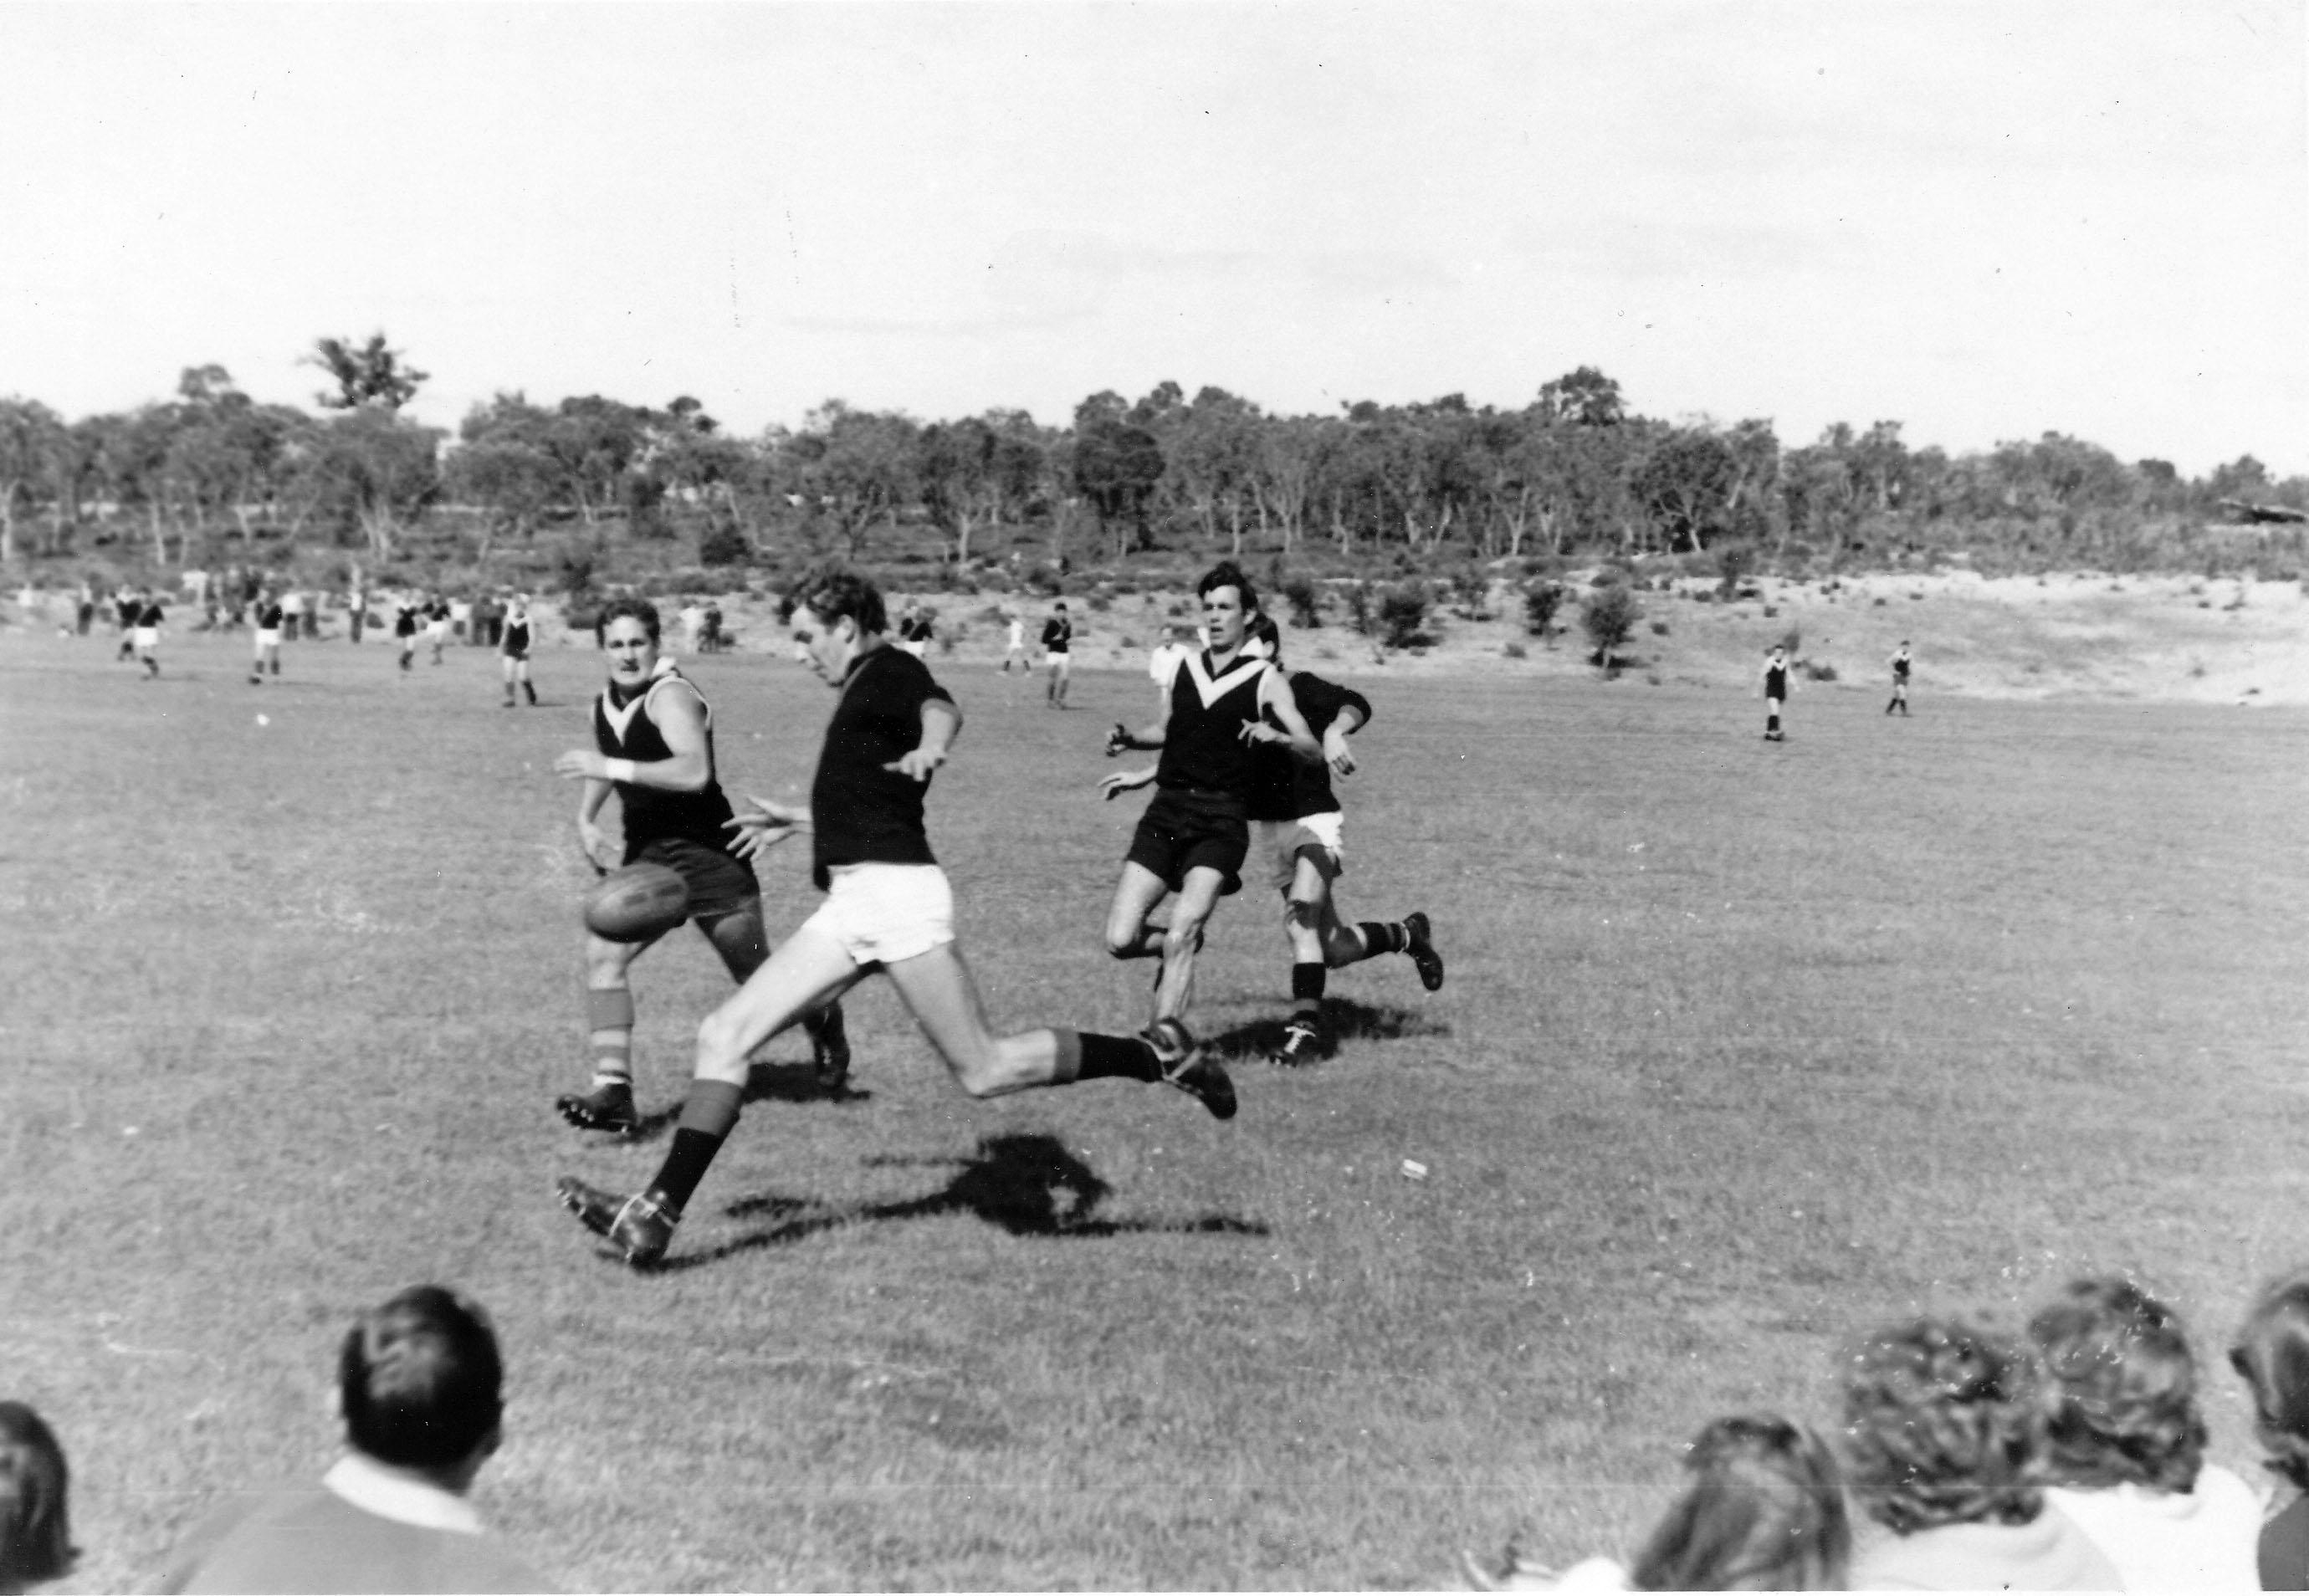 185. Highgate Football Club, 1965